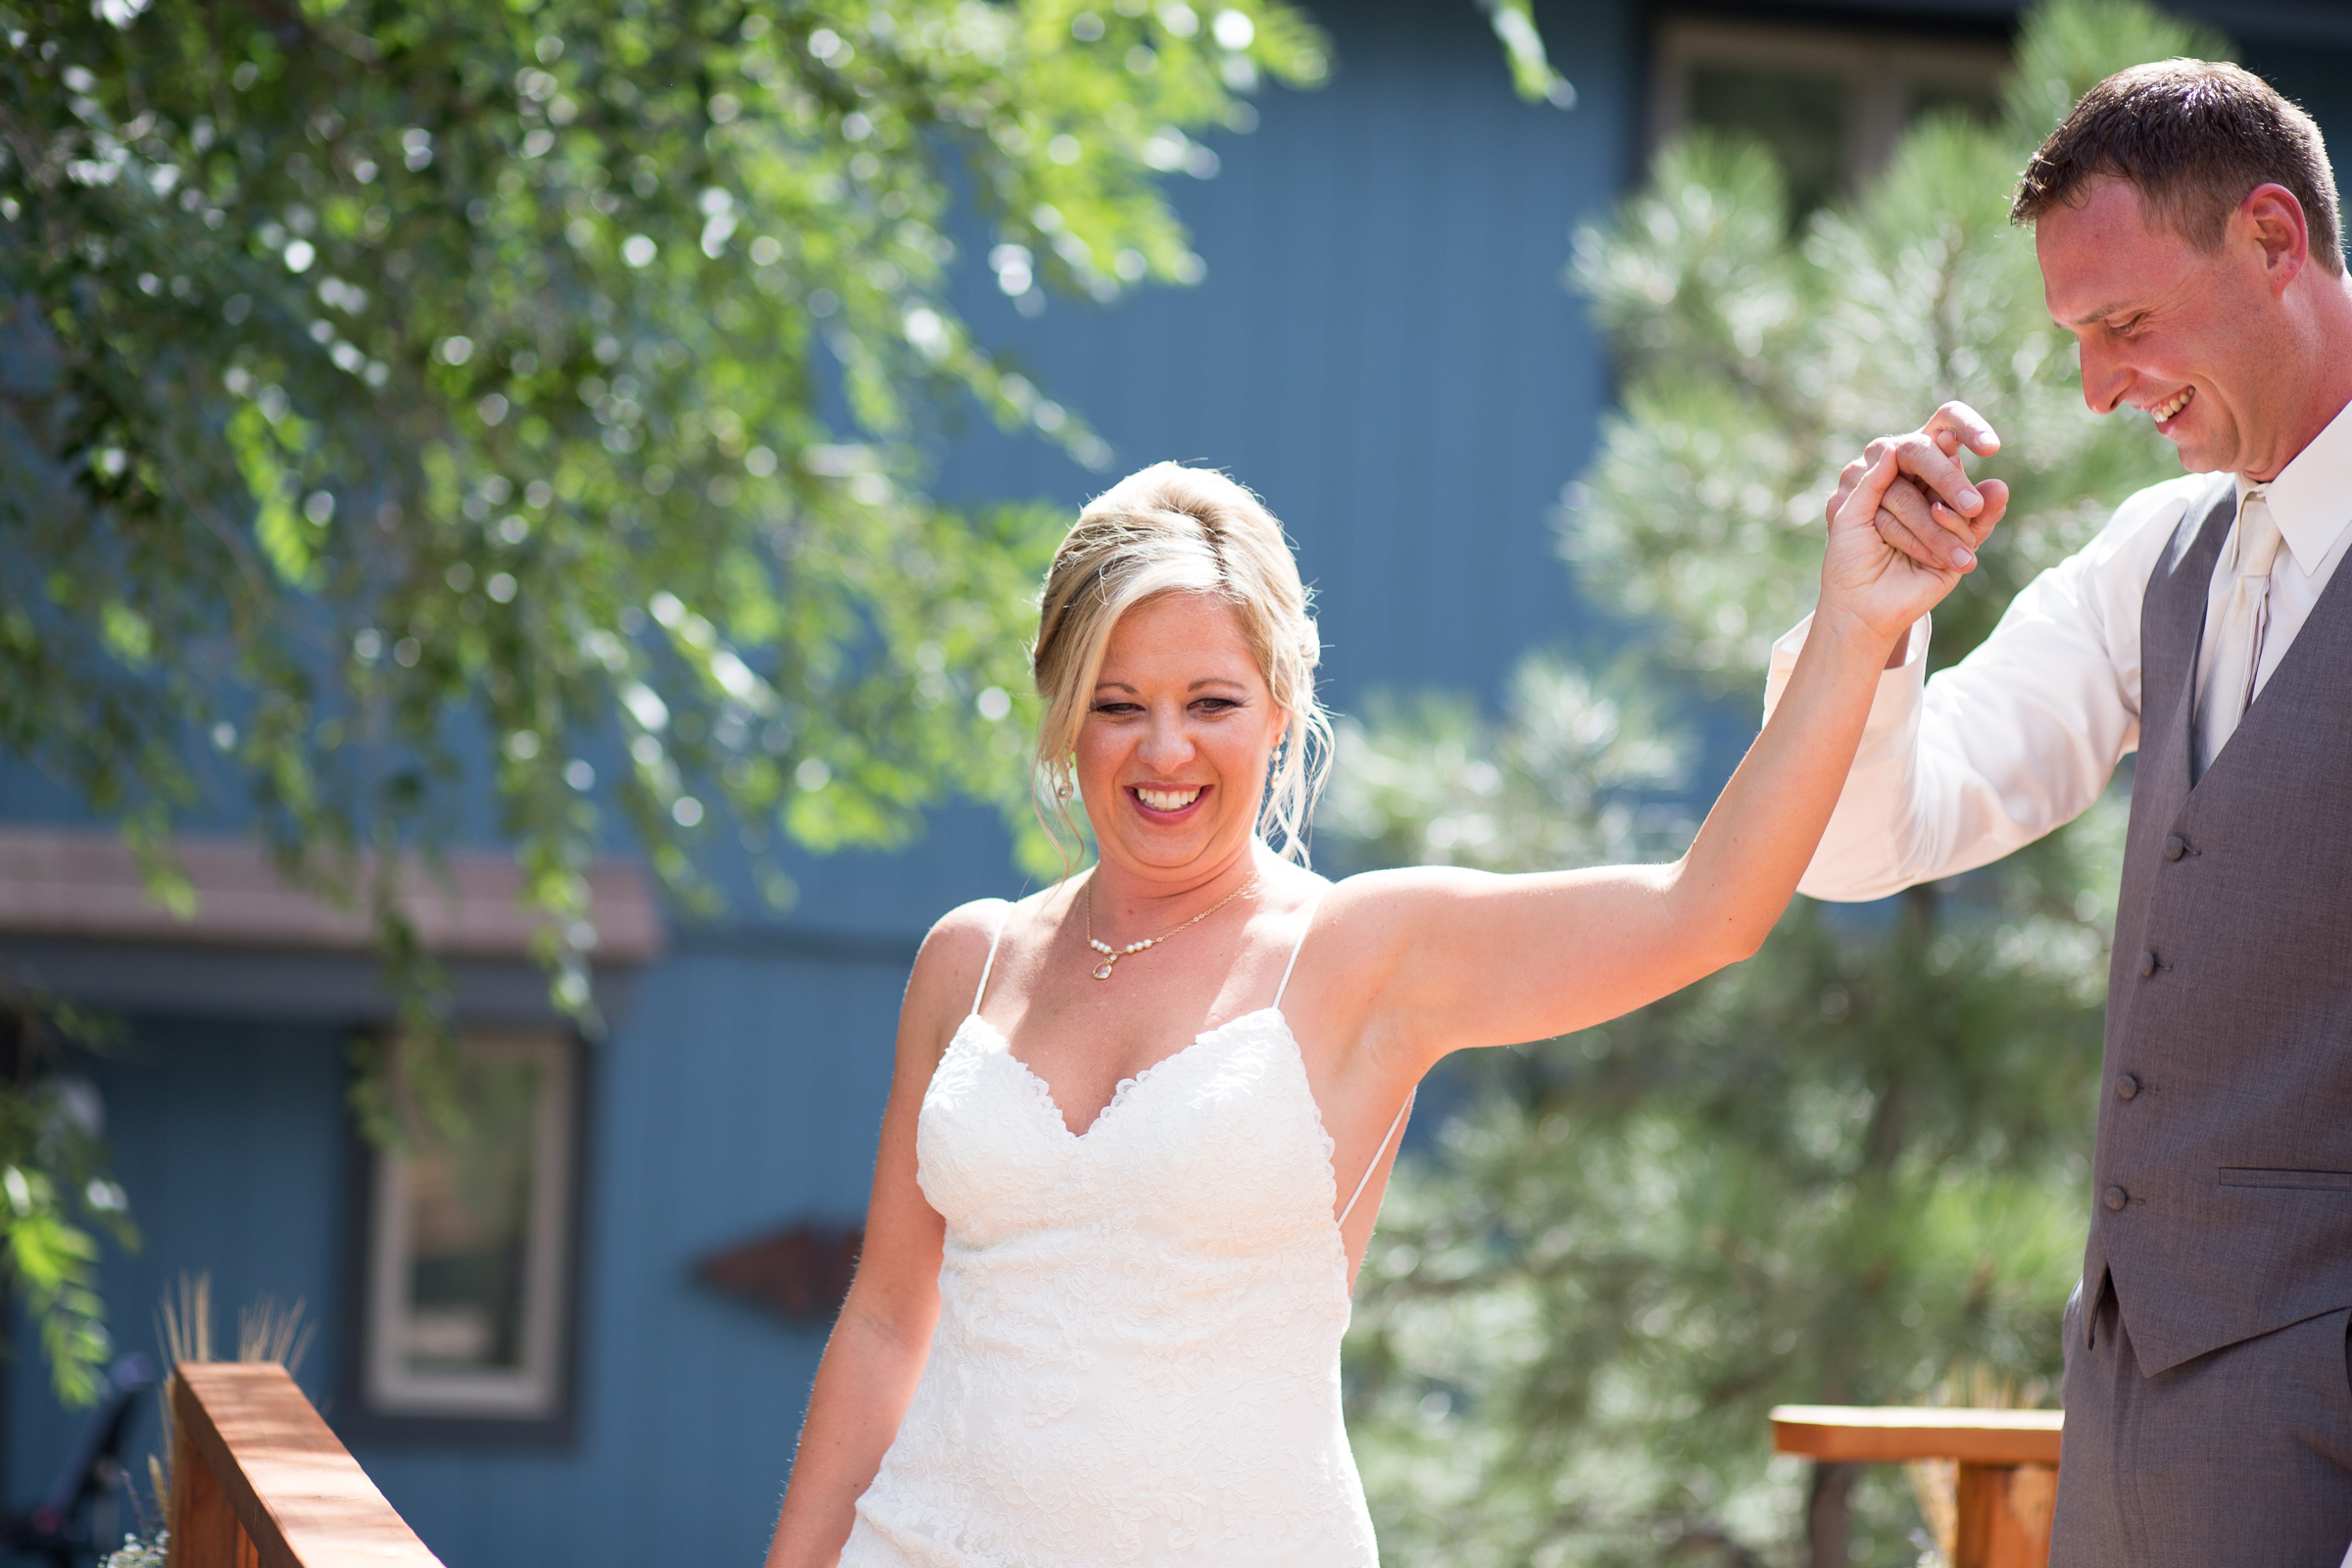 Stacy Carosa Photography - Wedding - Featured4.jpg